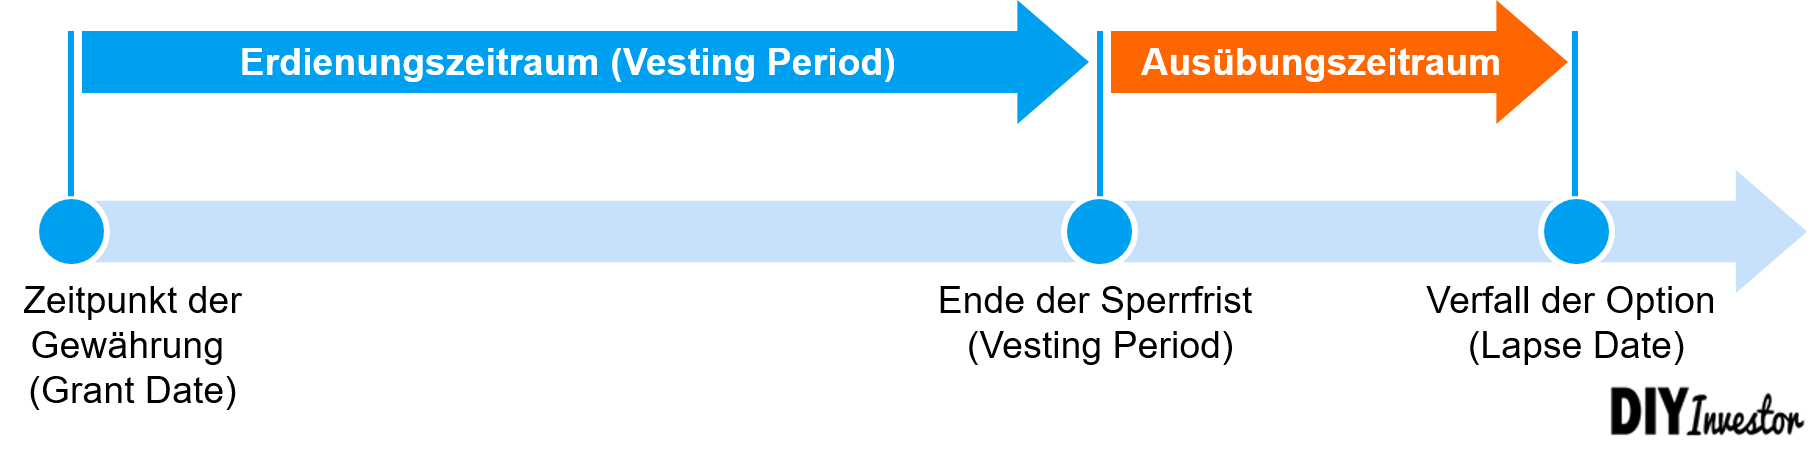 Aktienbasierte Vergütung - Sperrfrist bzw. Vesting Period